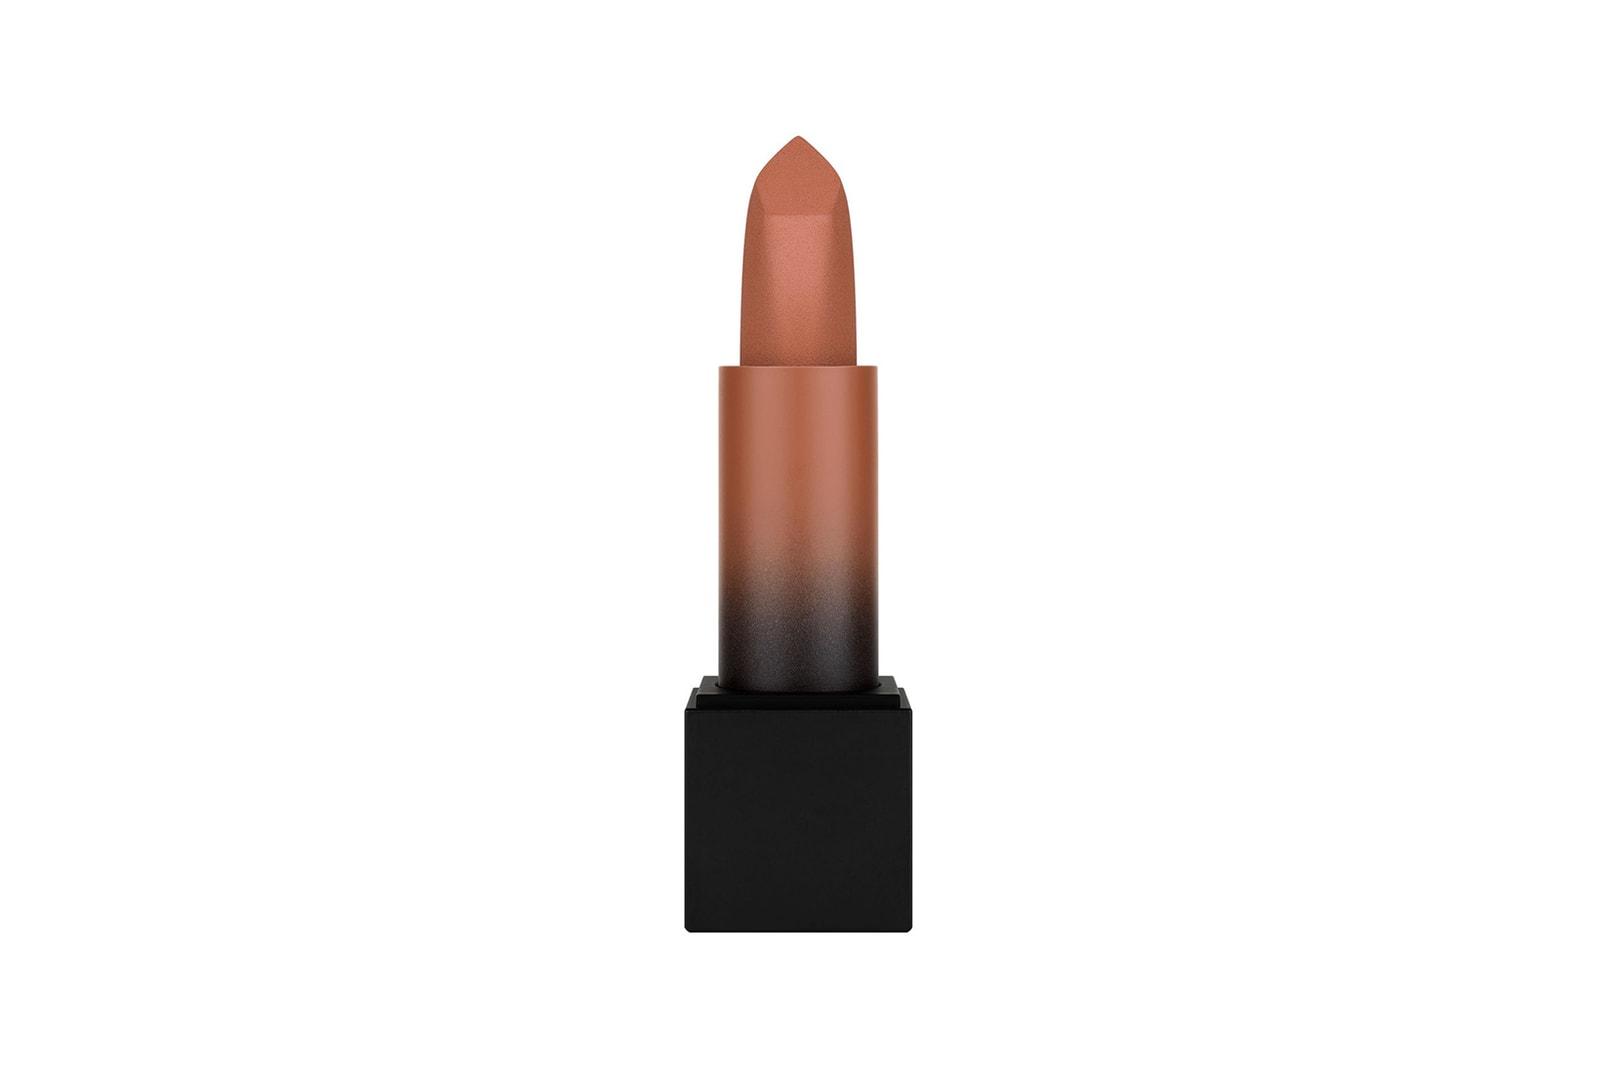 lipstick color lips charlotte tilbury walk of shame red makeup beauty